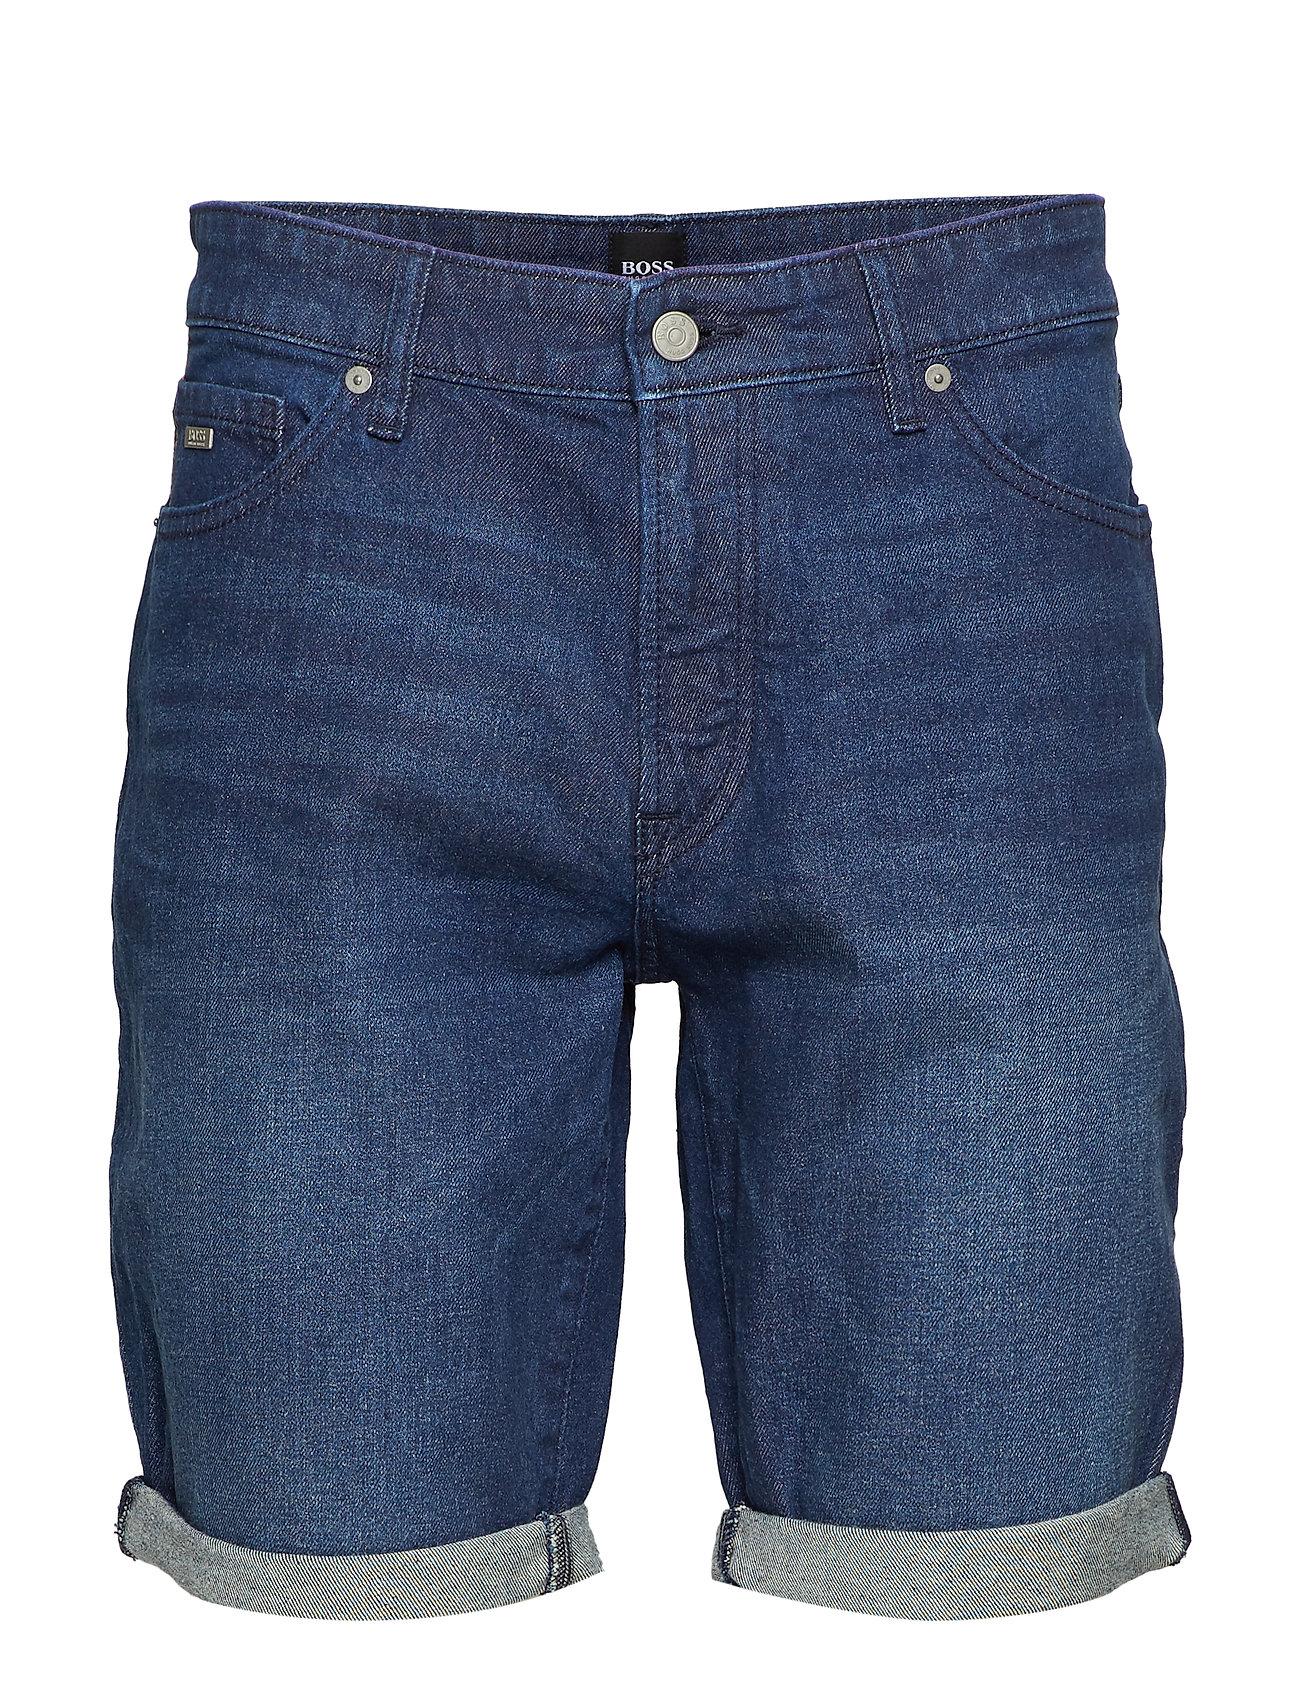 Boss Casual Wear Maine Shorts BC-L-C - DARK BLUE